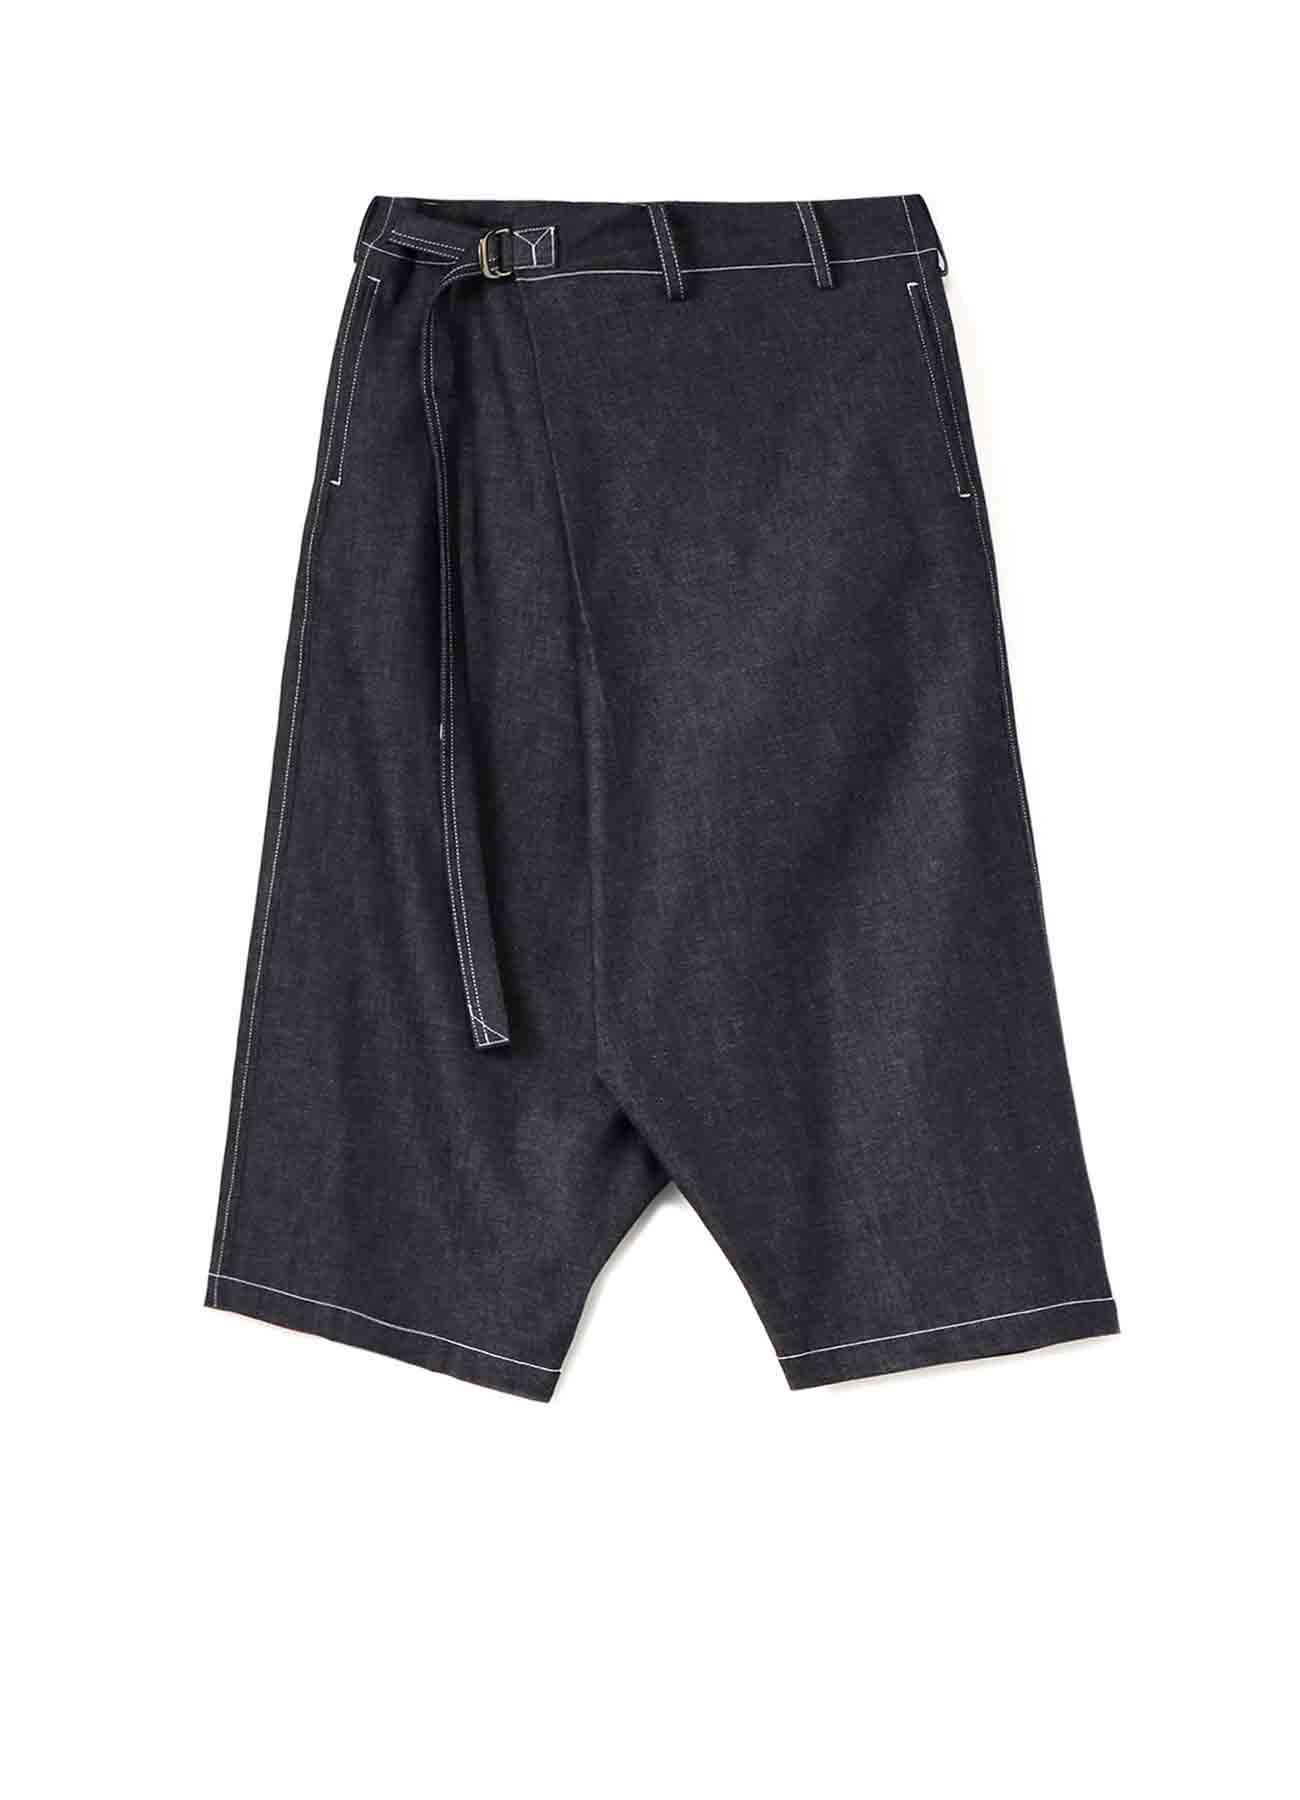 6oz Denim Wrap Short Pants